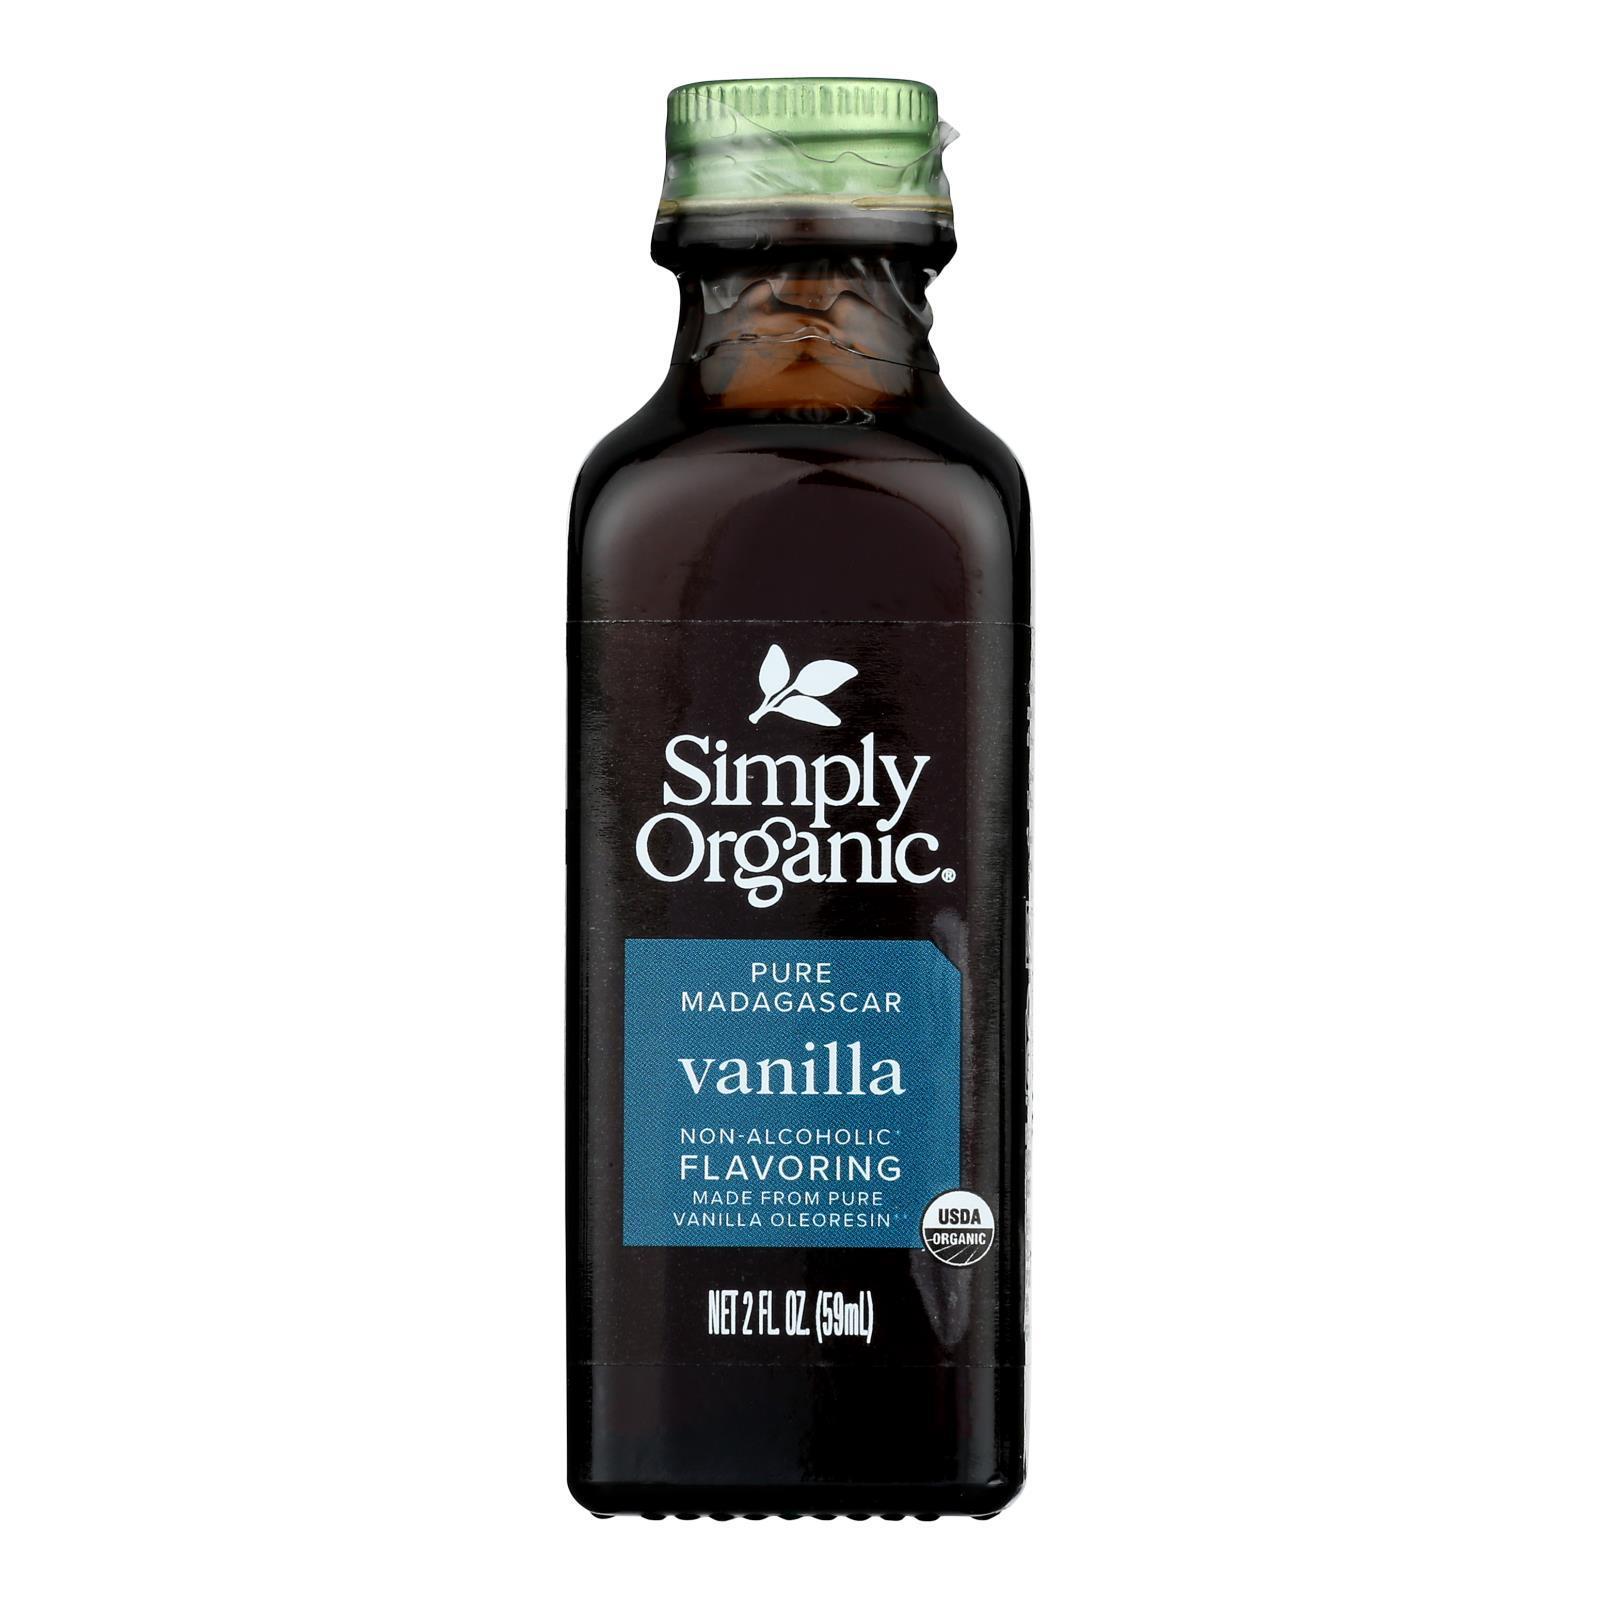 Simply Organic Vanilla Flavoring - Organic - 2 oz - Case of 6